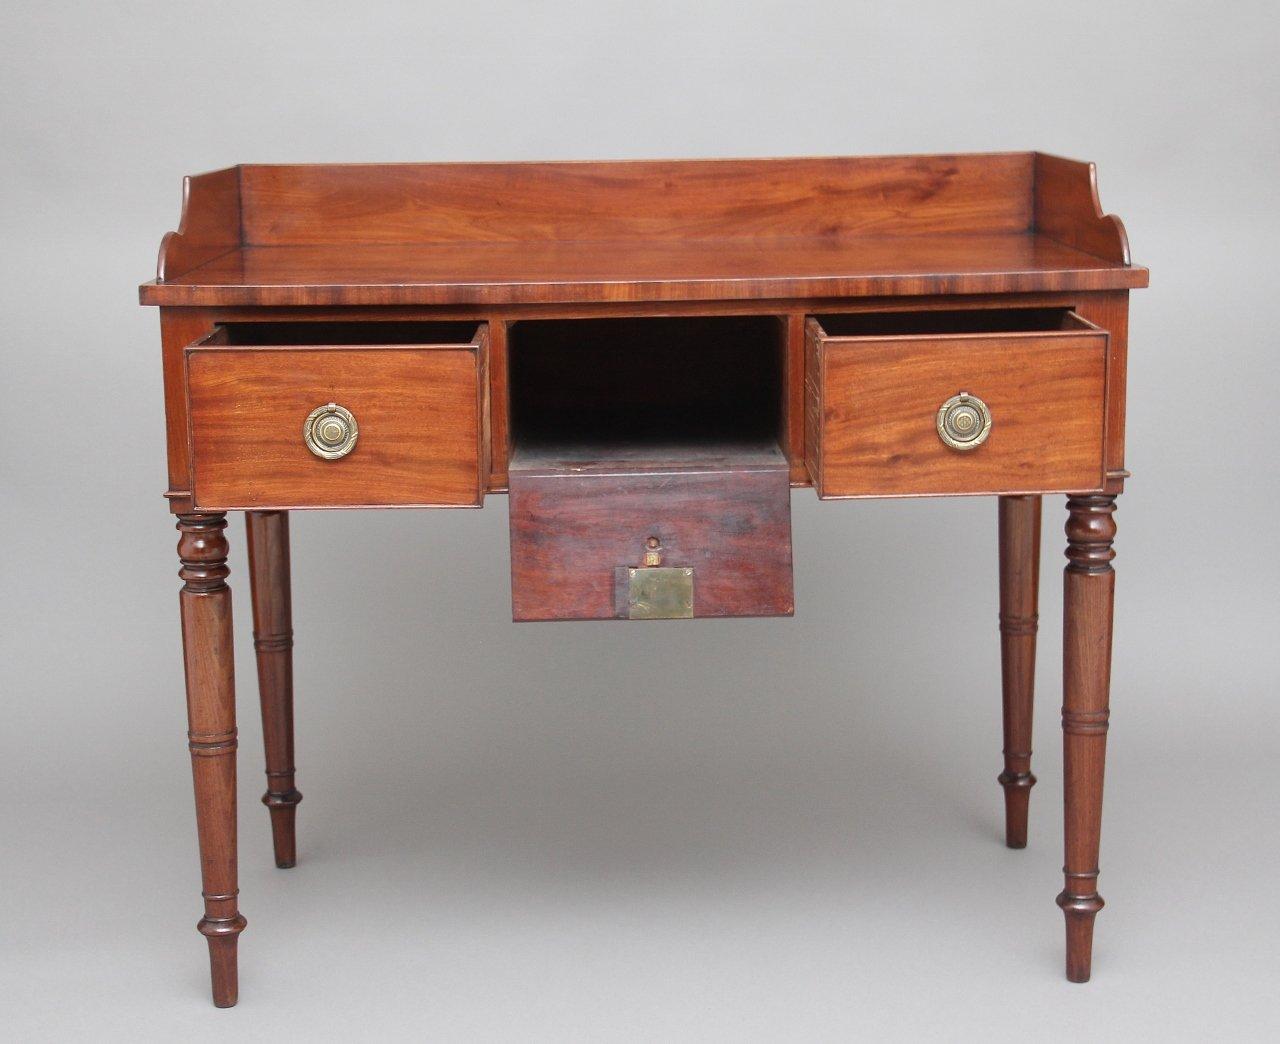 Antique Mahogany Writing Table - Antique Mahogany Writing Table For Sale At Pamono